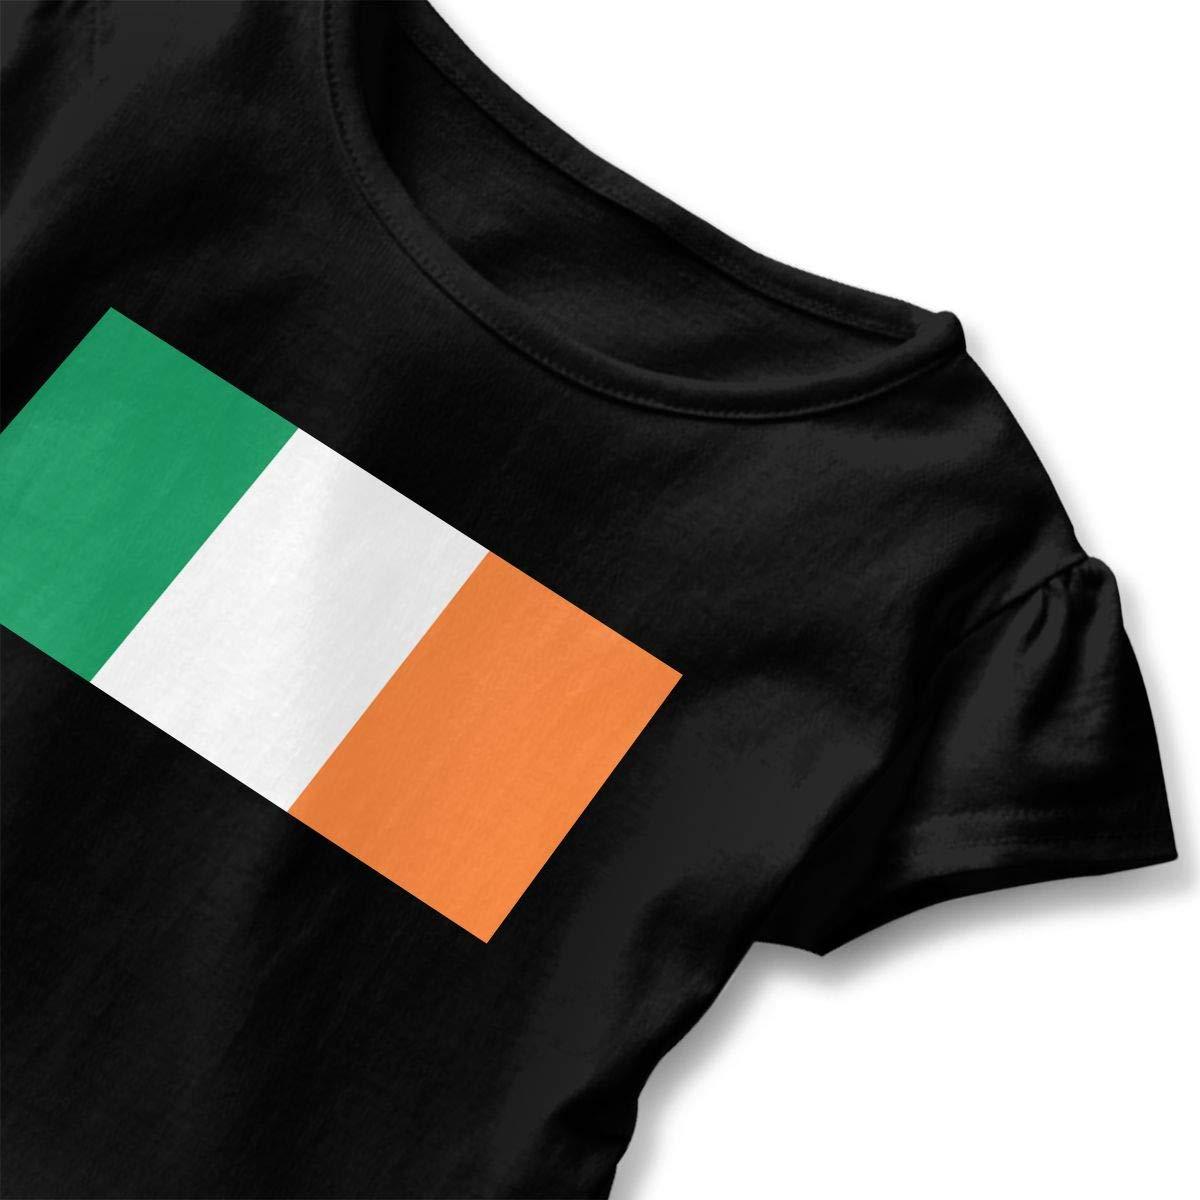 SHIRT1-KIDS Irish Flag T-Shirts Toddler//Infant Girls Short Sleeve Ruffles Shirt Tee Jersey for 2-6T